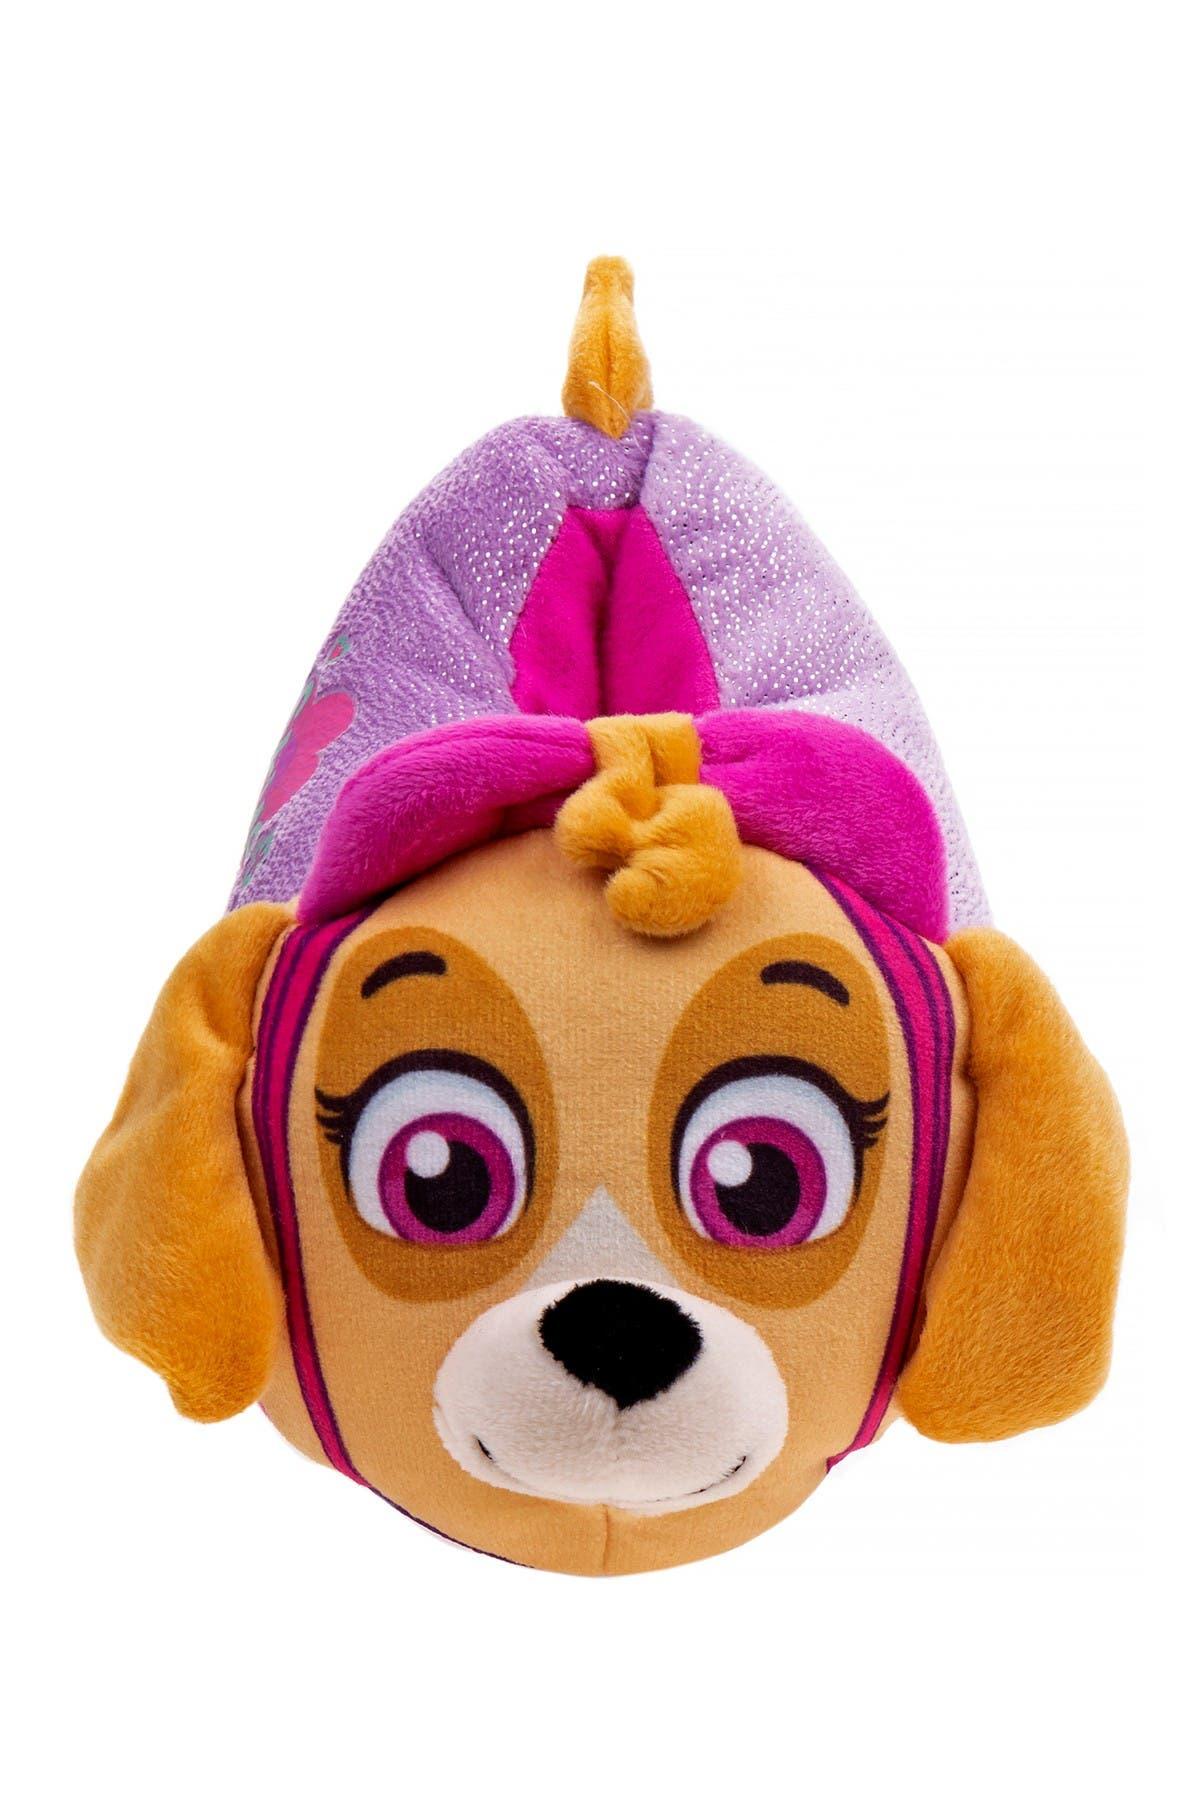 Josmo Nickelodeon Paw Patrol Slipper